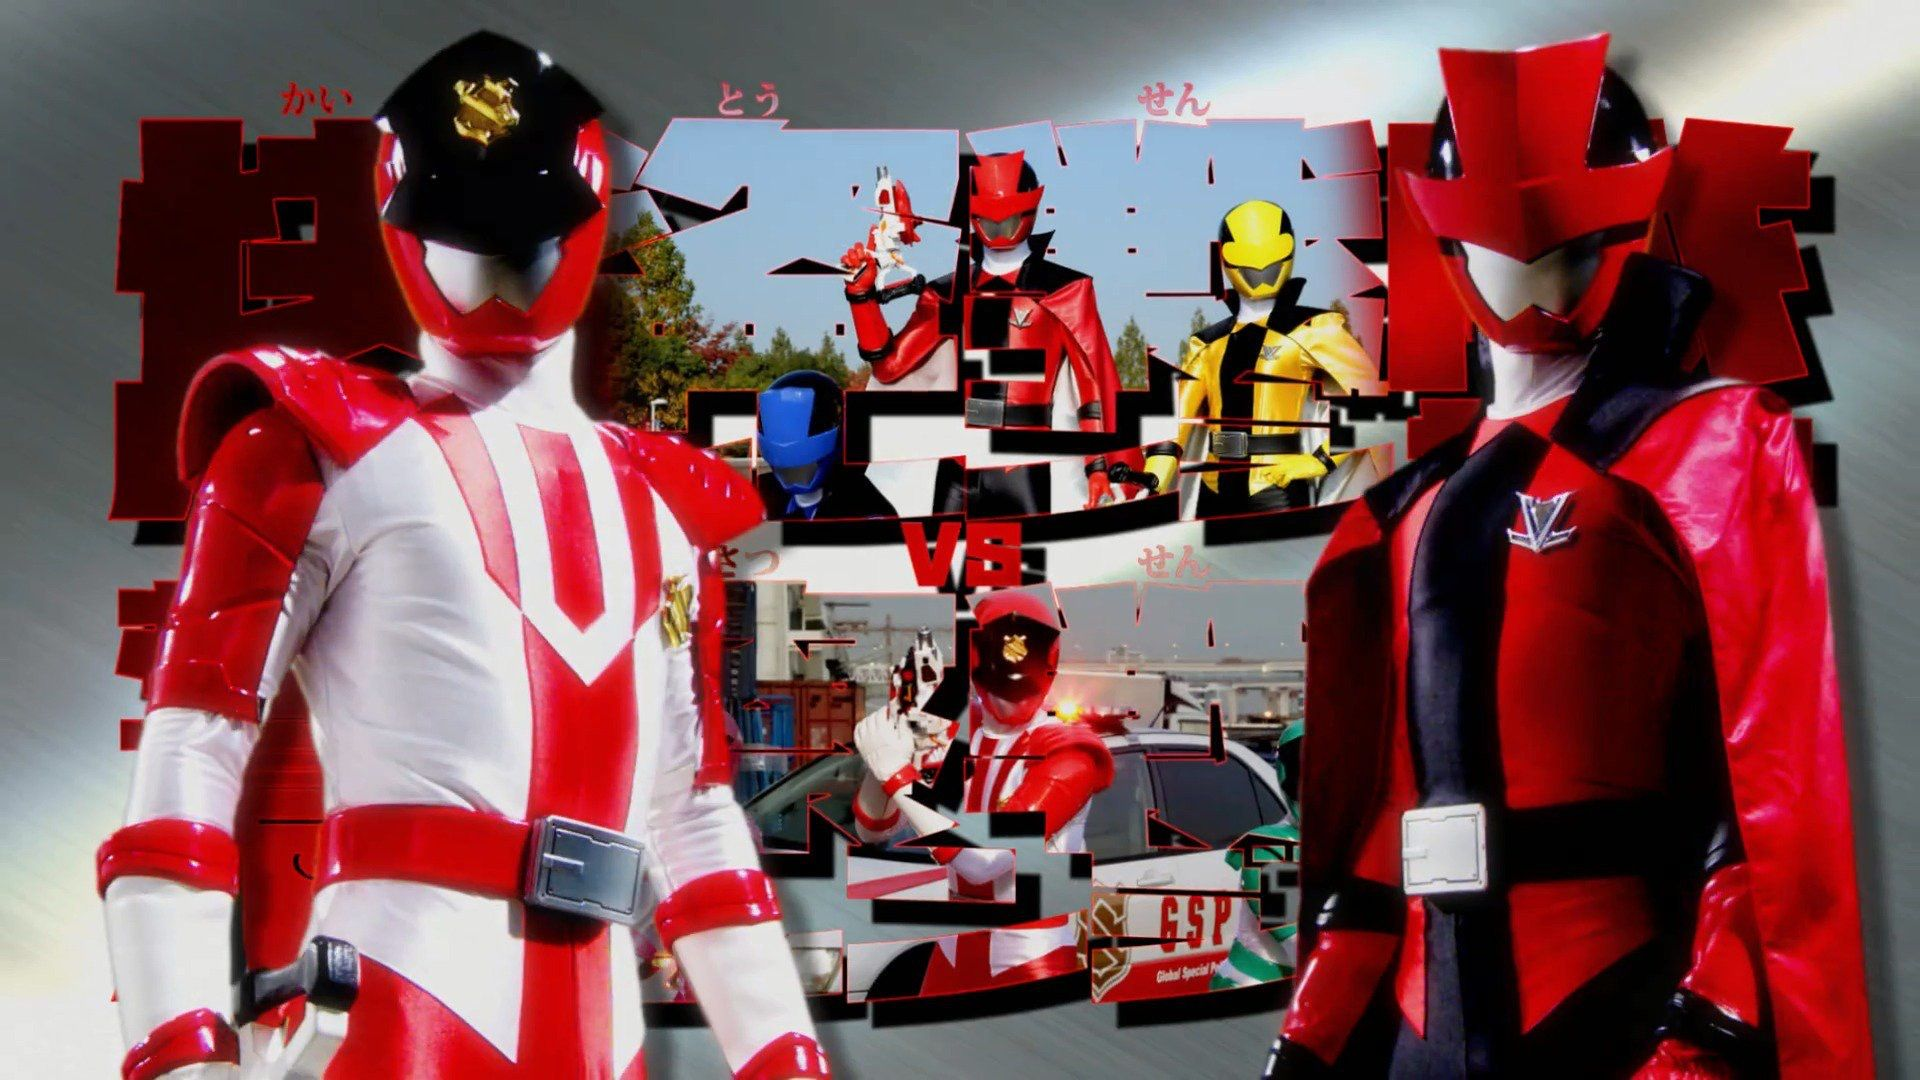 Kaitou Sentai Lupinranger Vs Keisatsu Sentai Patranger 5